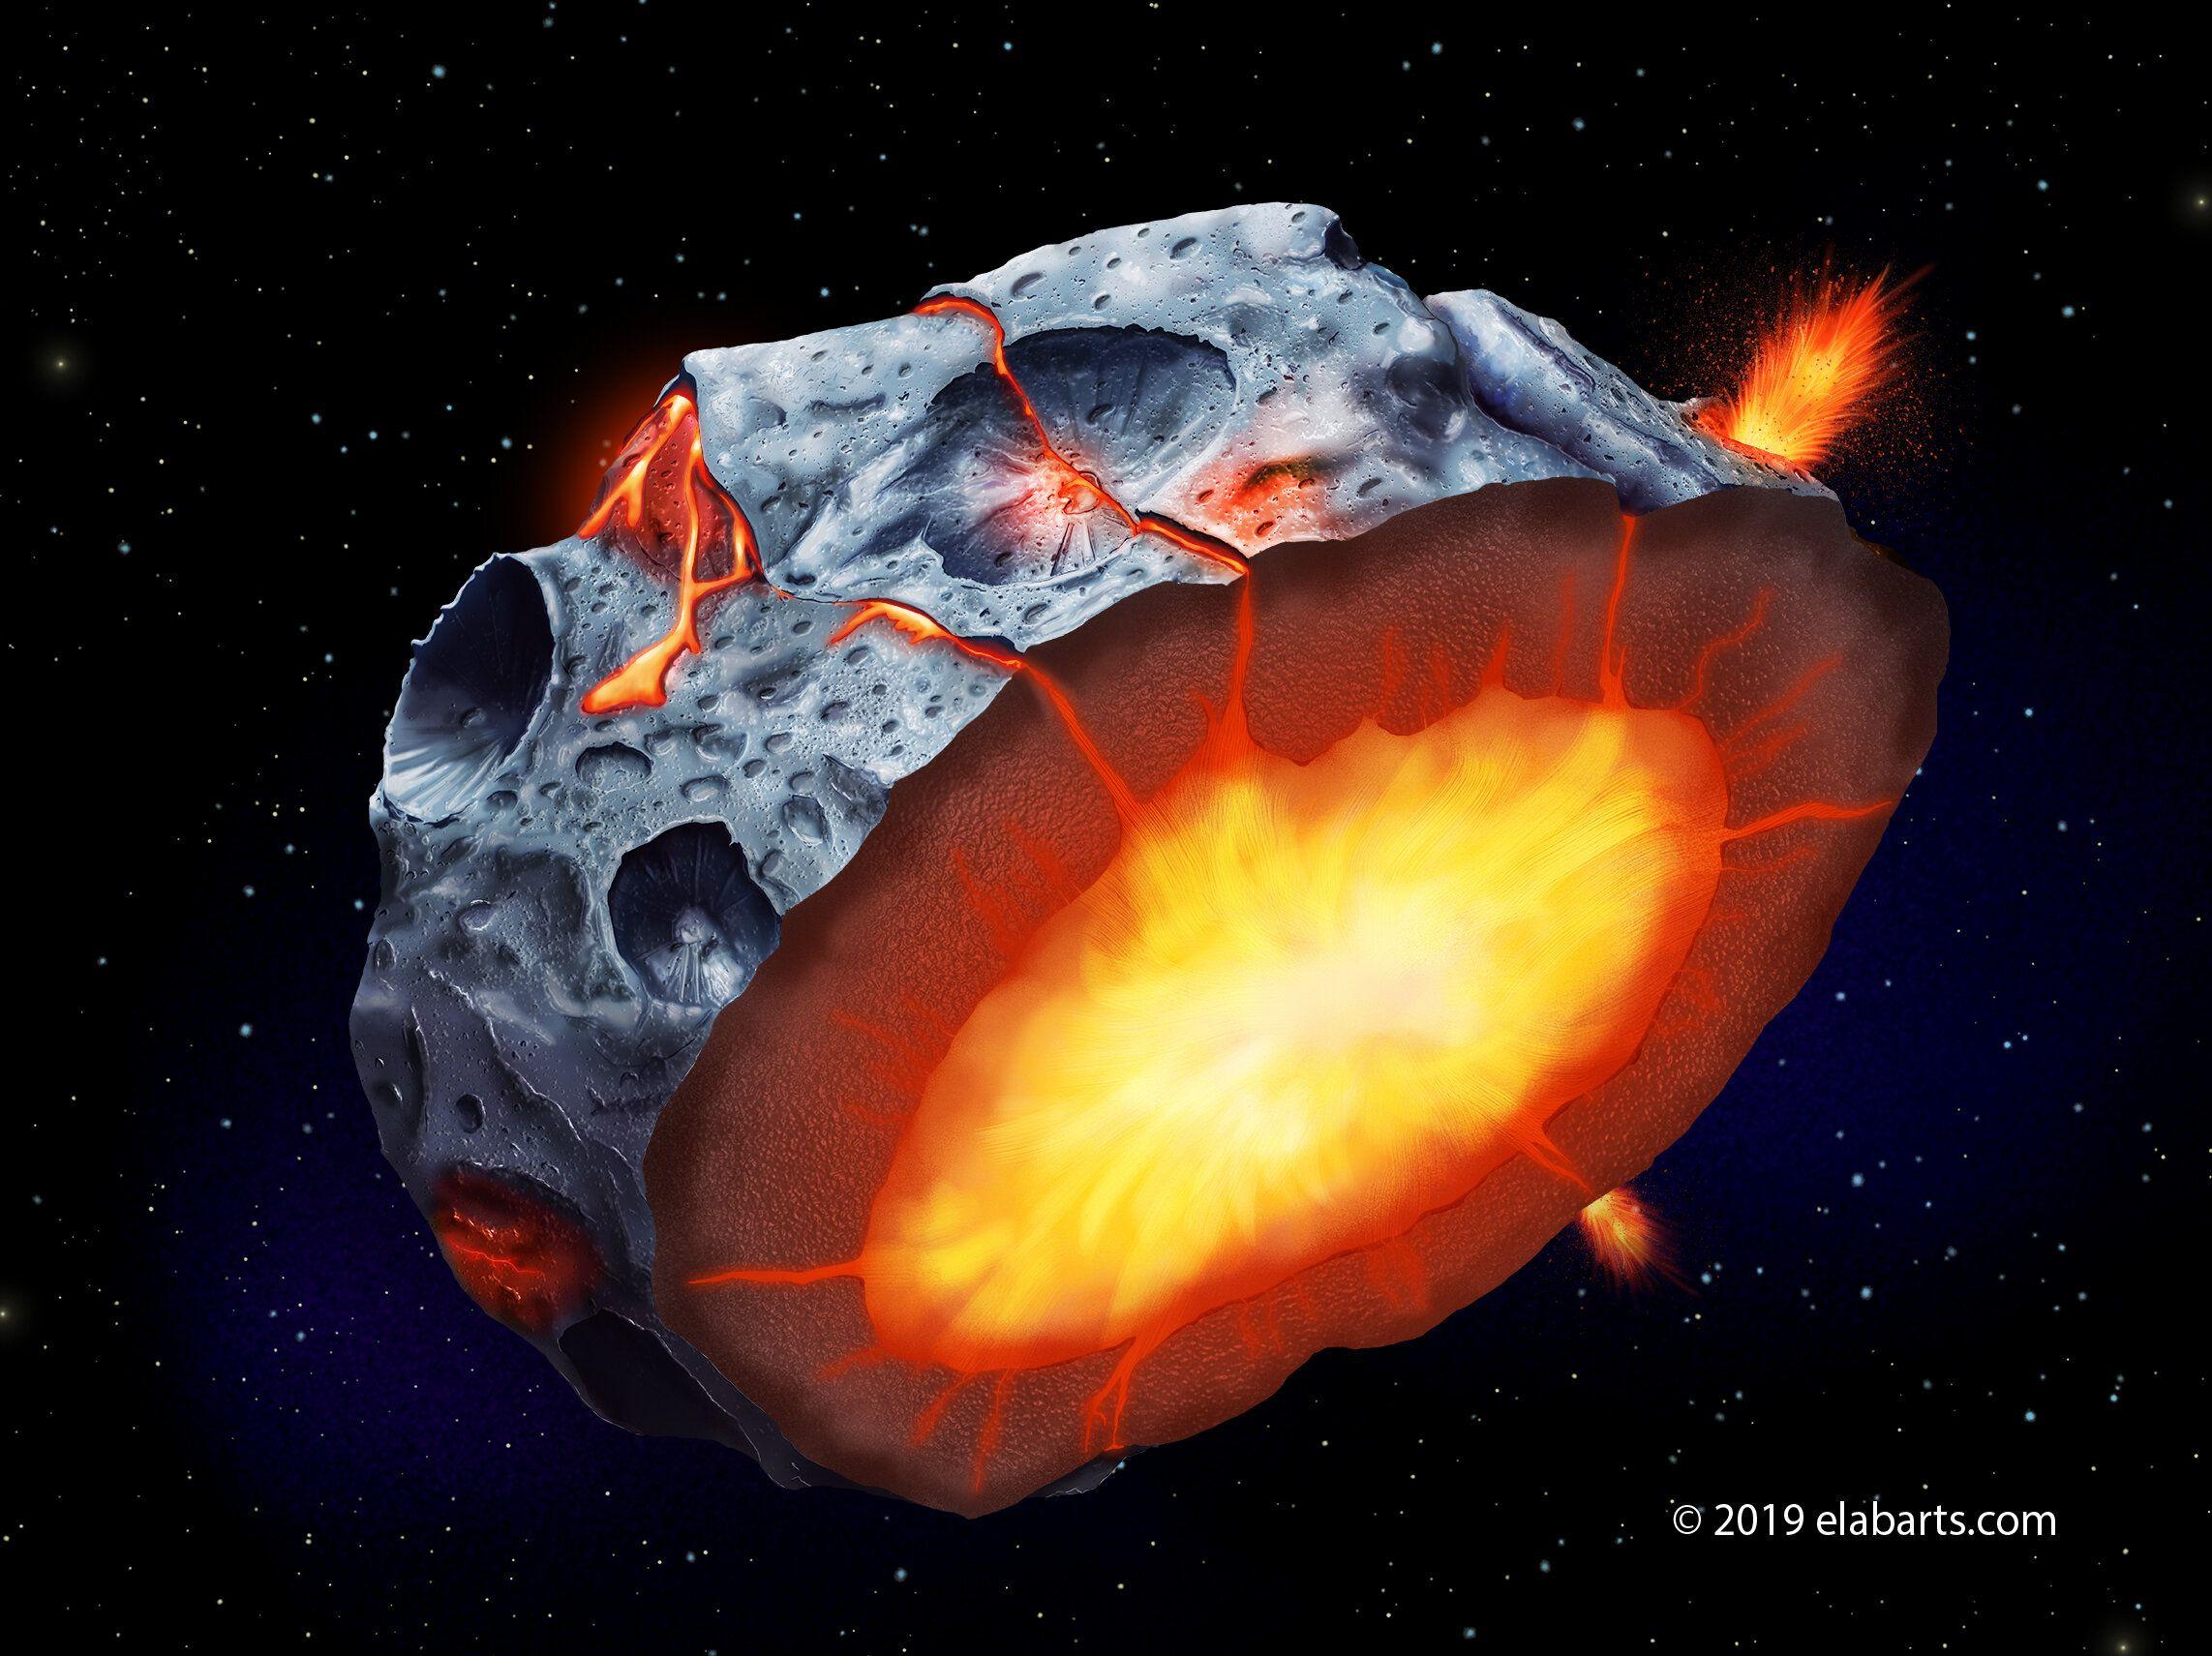 iron volcanoes, metal asteroids